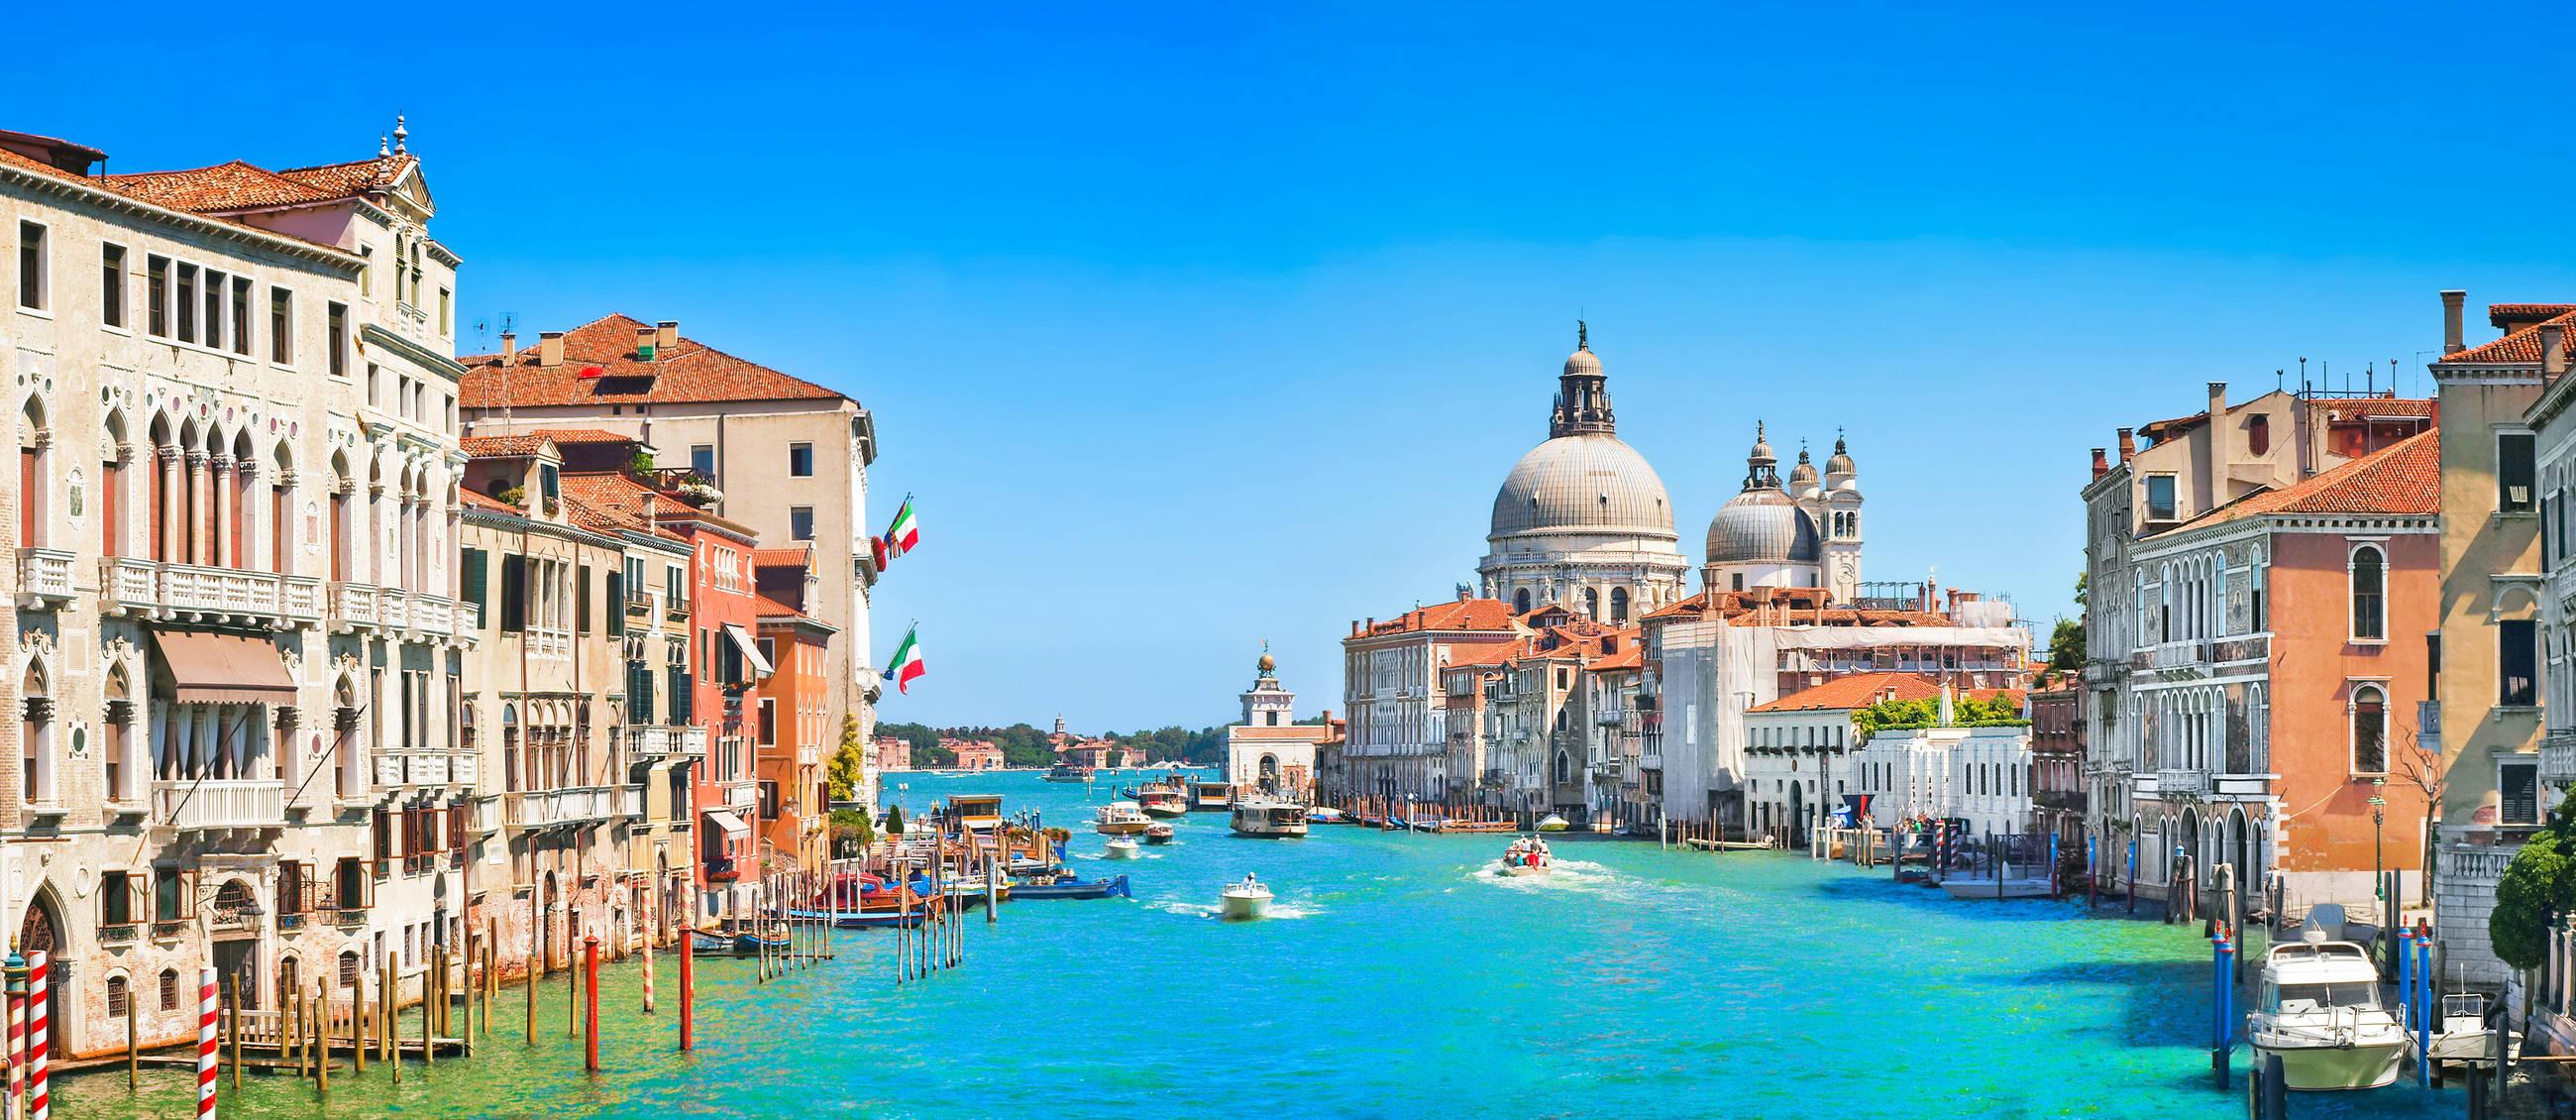 Hidden-Gems-Of-Venice-You've-Just-Got To Visit